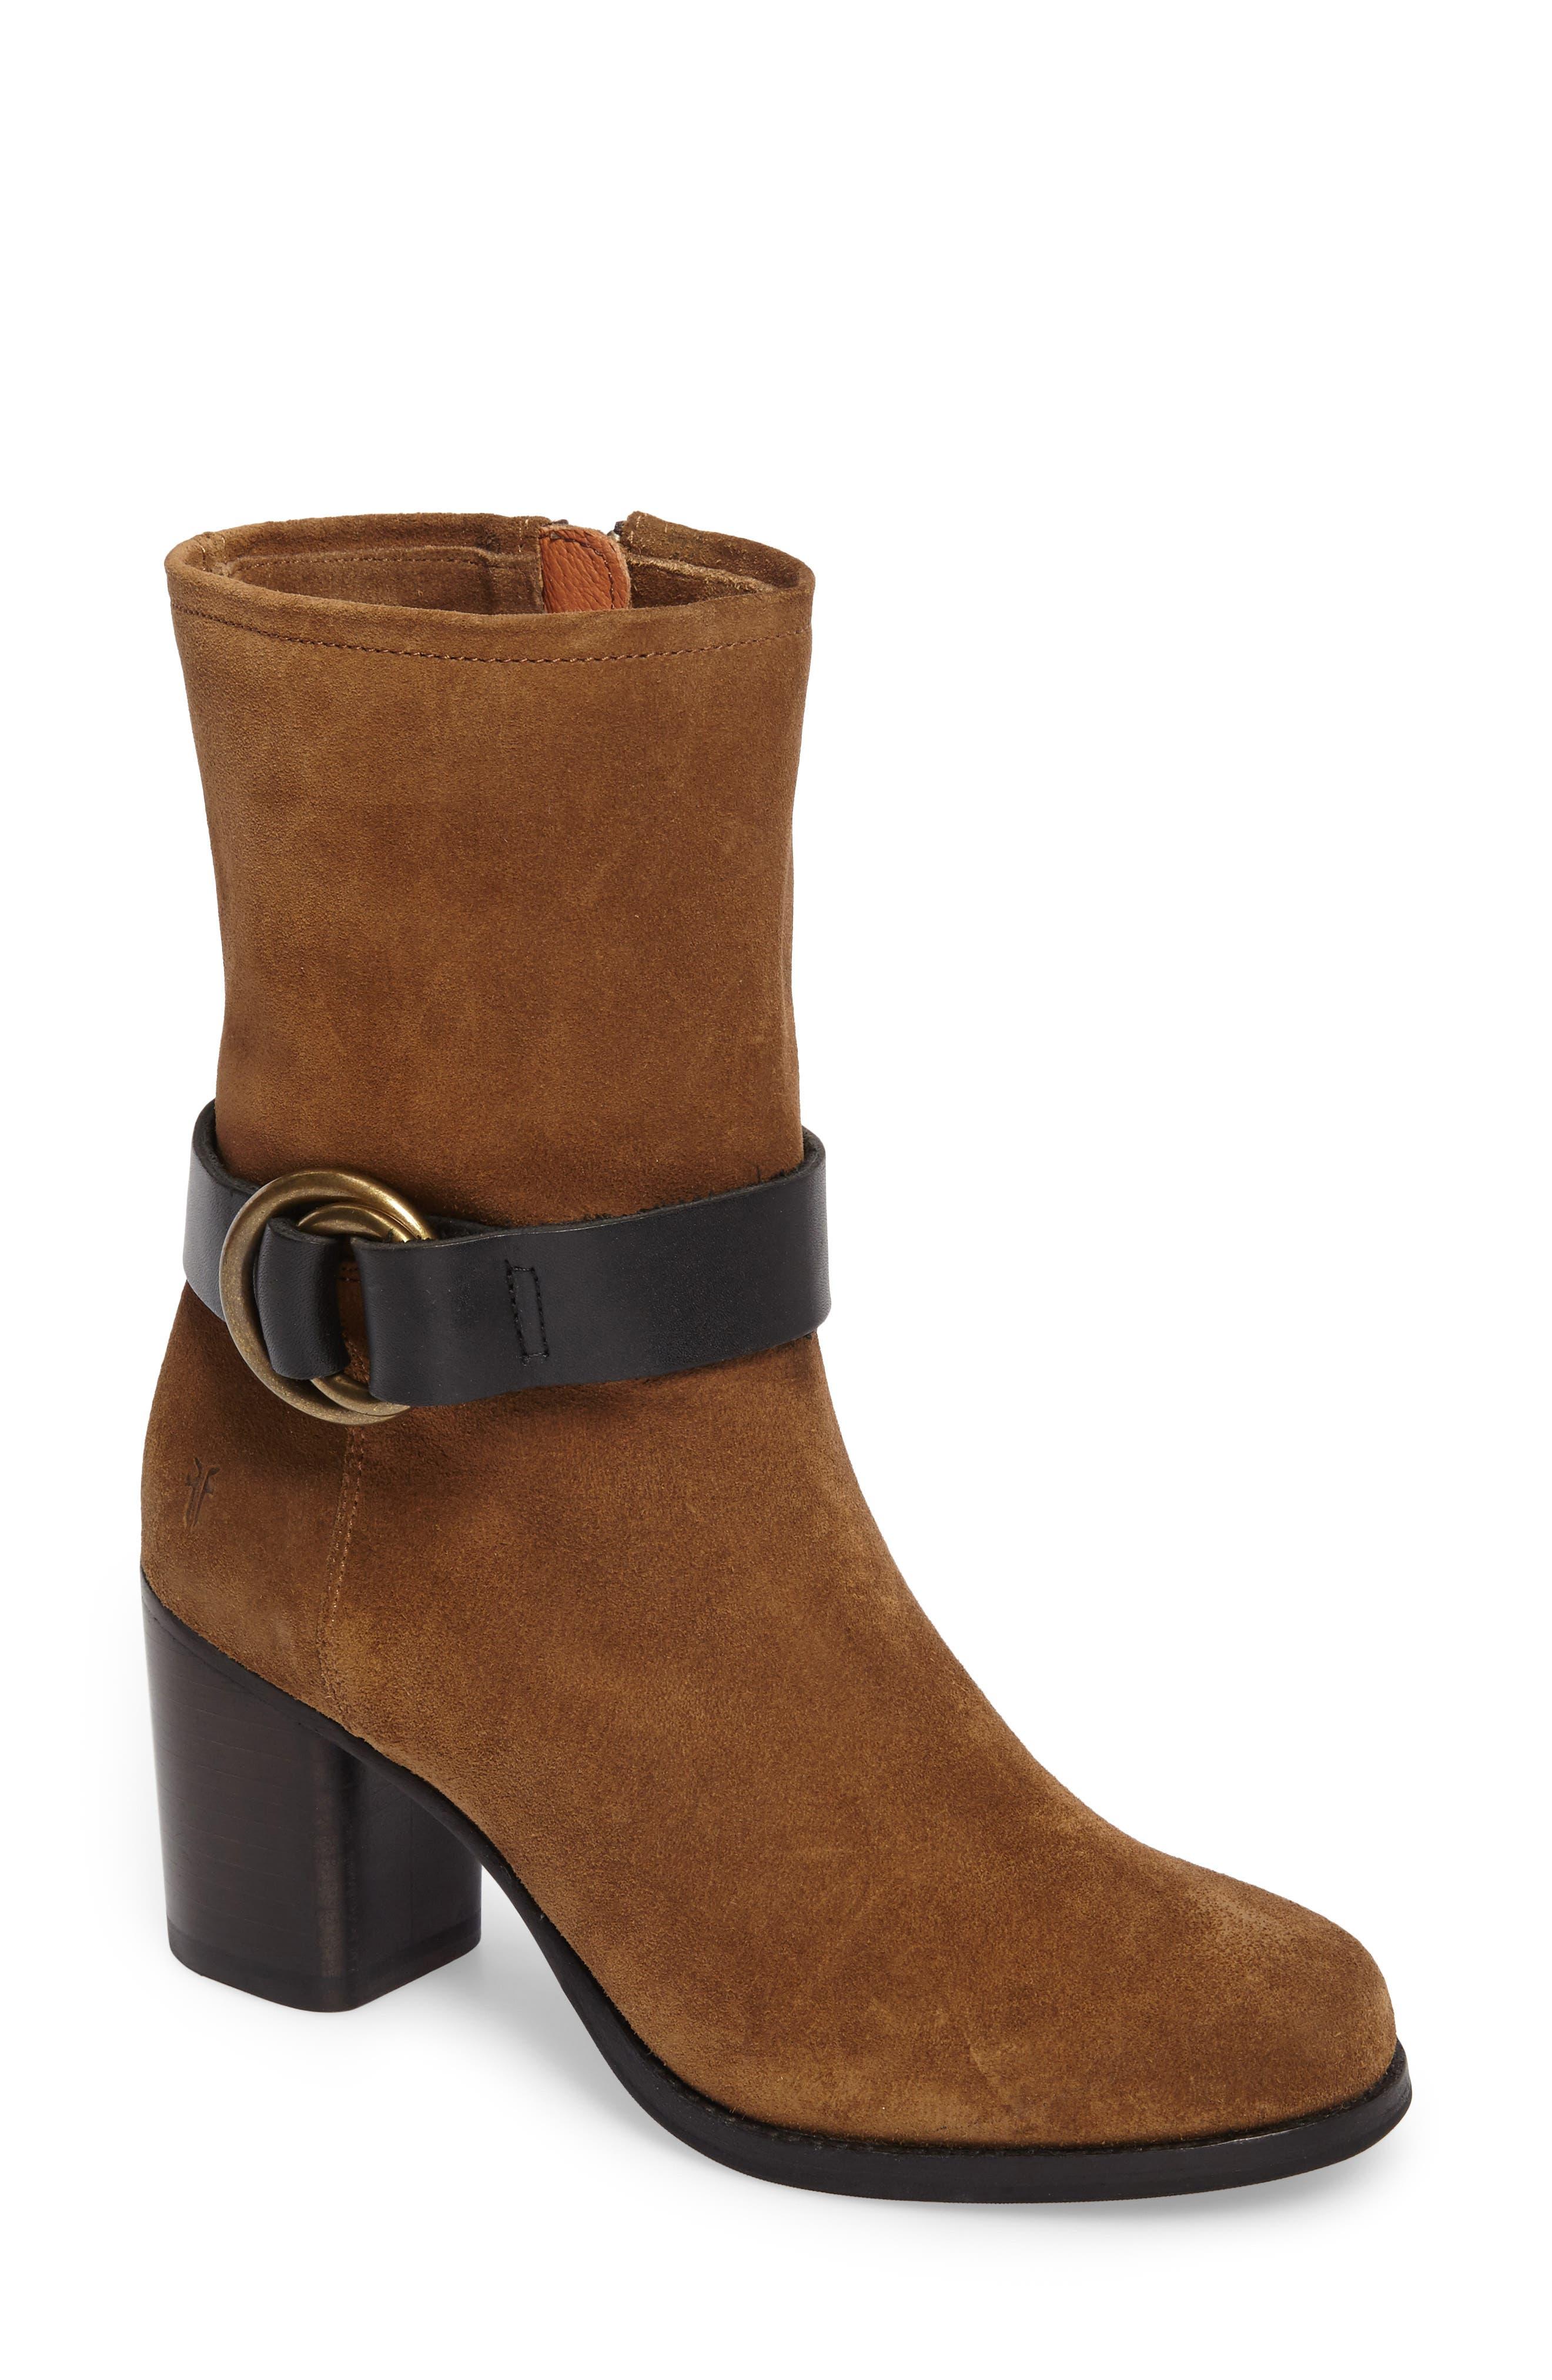 Main Image - Frye Addie Harness Boot (Women)